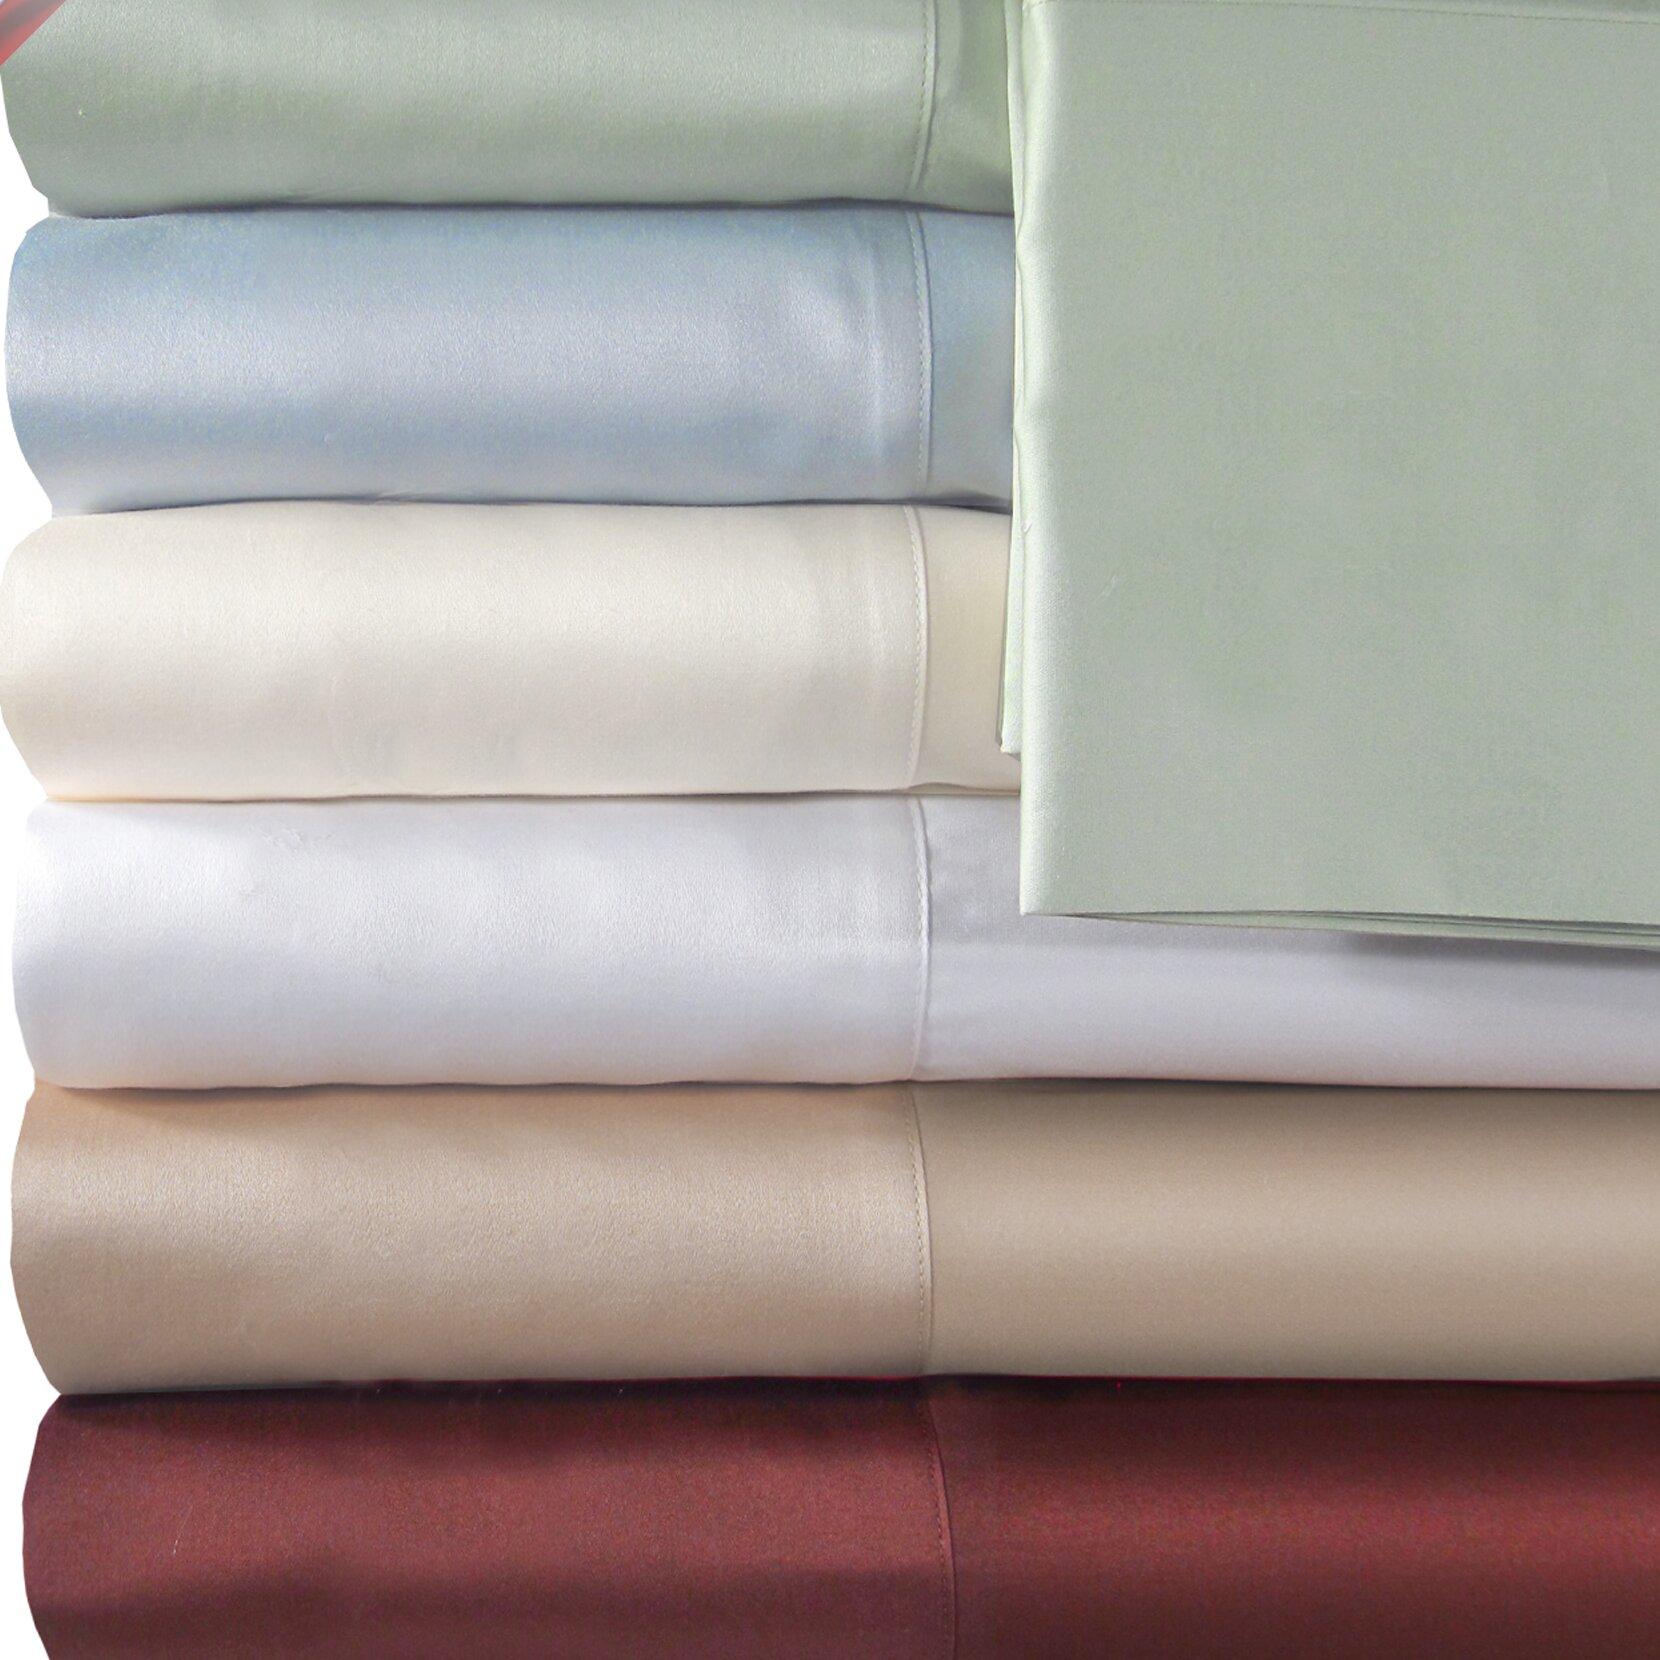 veratex supreme sateen 500 thread count solid sheet set reviews wayfair. Black Bedroom Furniture Sets. Home Design Ideas